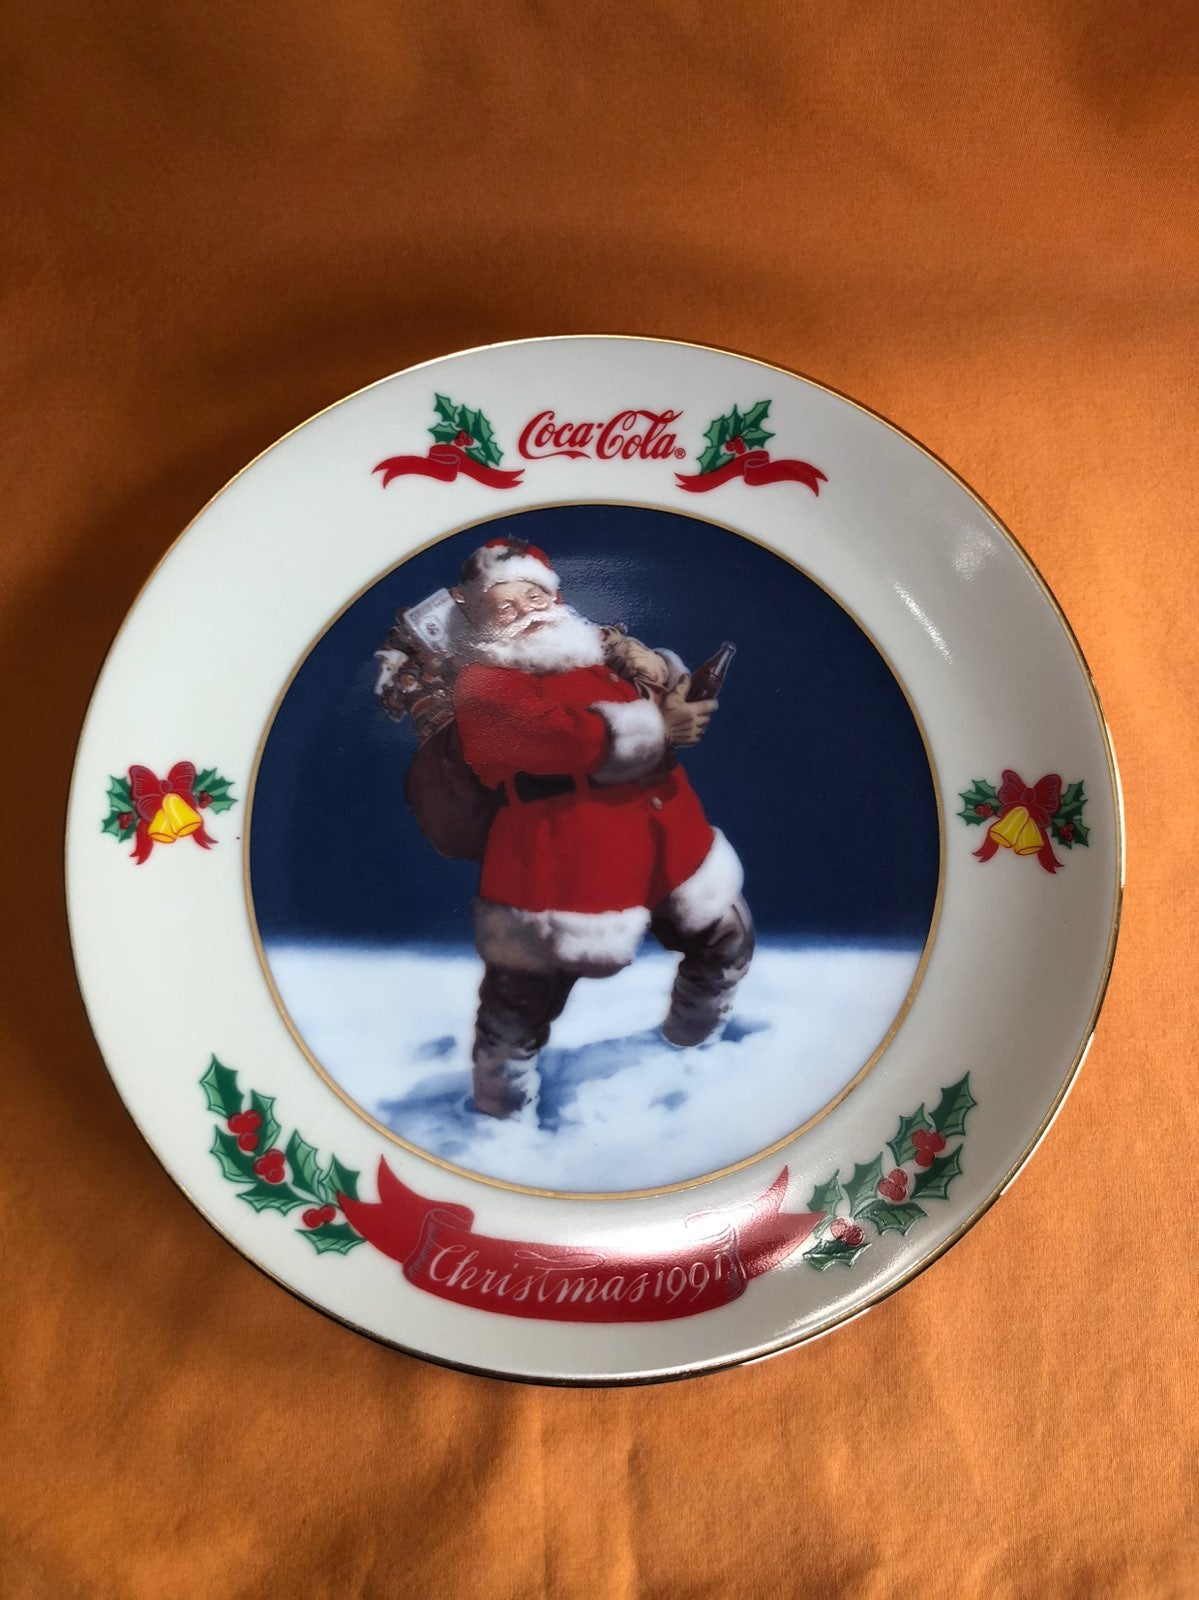 Coca Cola Christmas Plate 1991